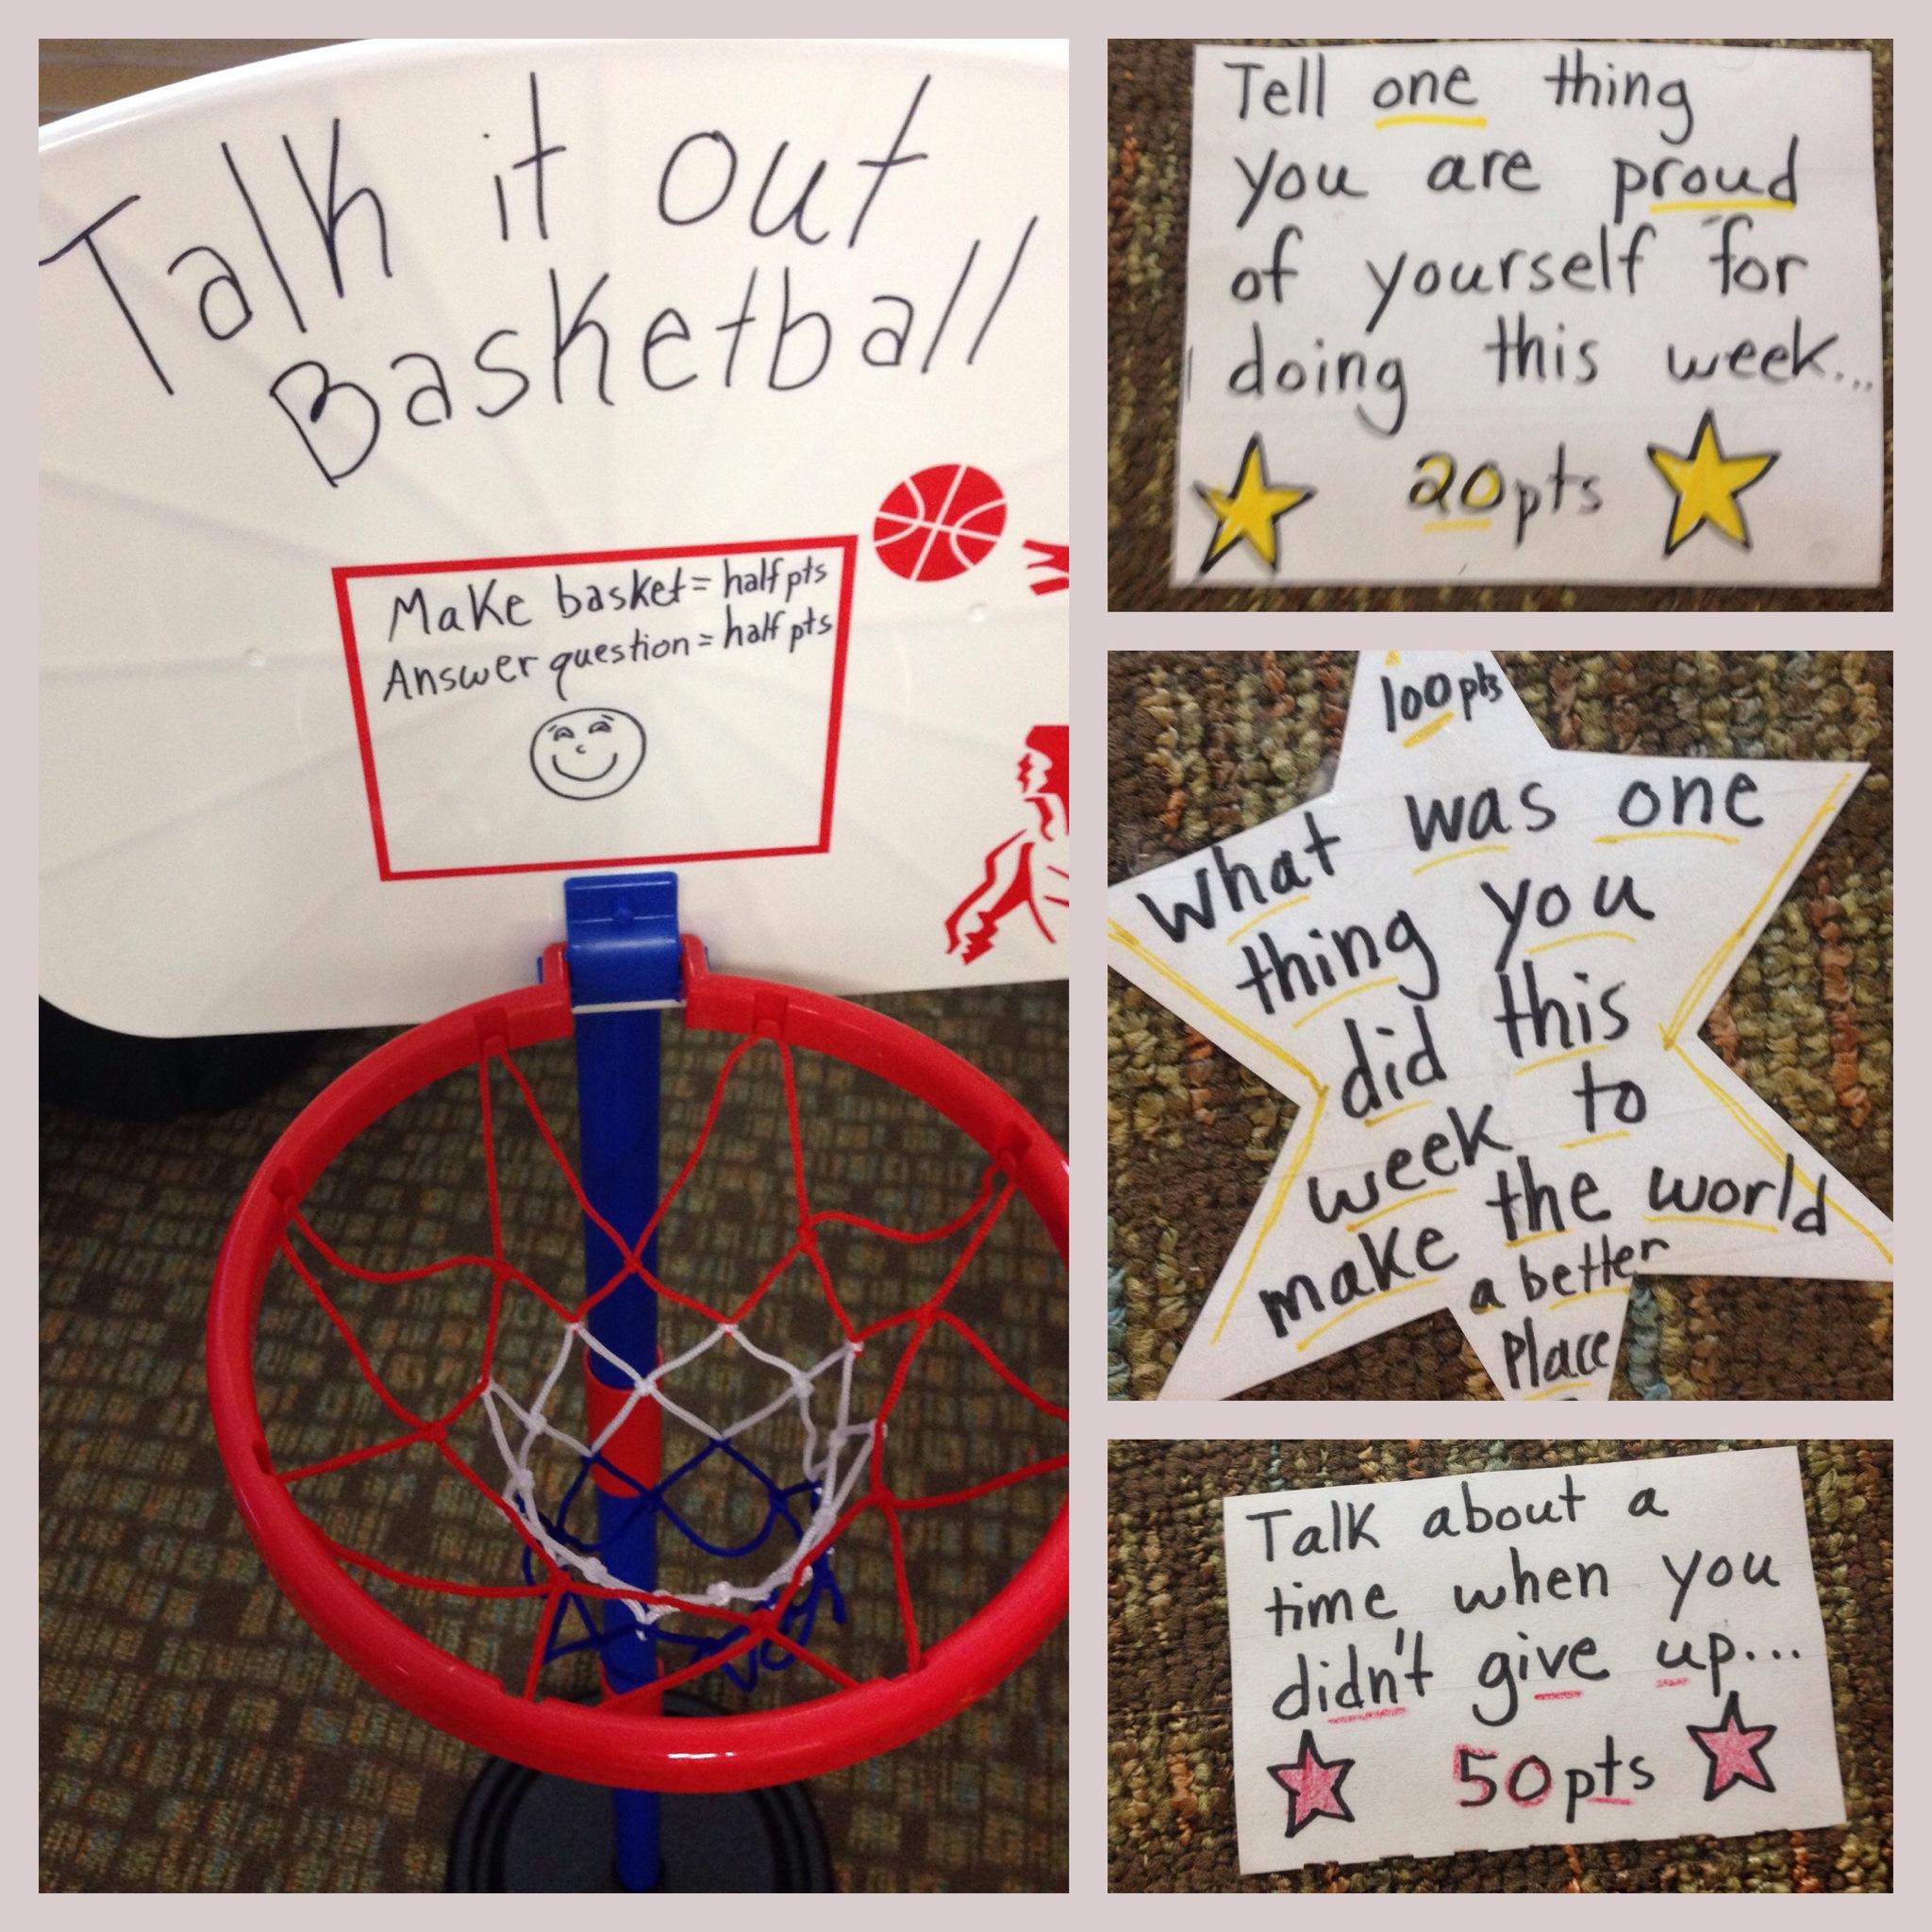 Talk It Out Basketball Art Of Social Work